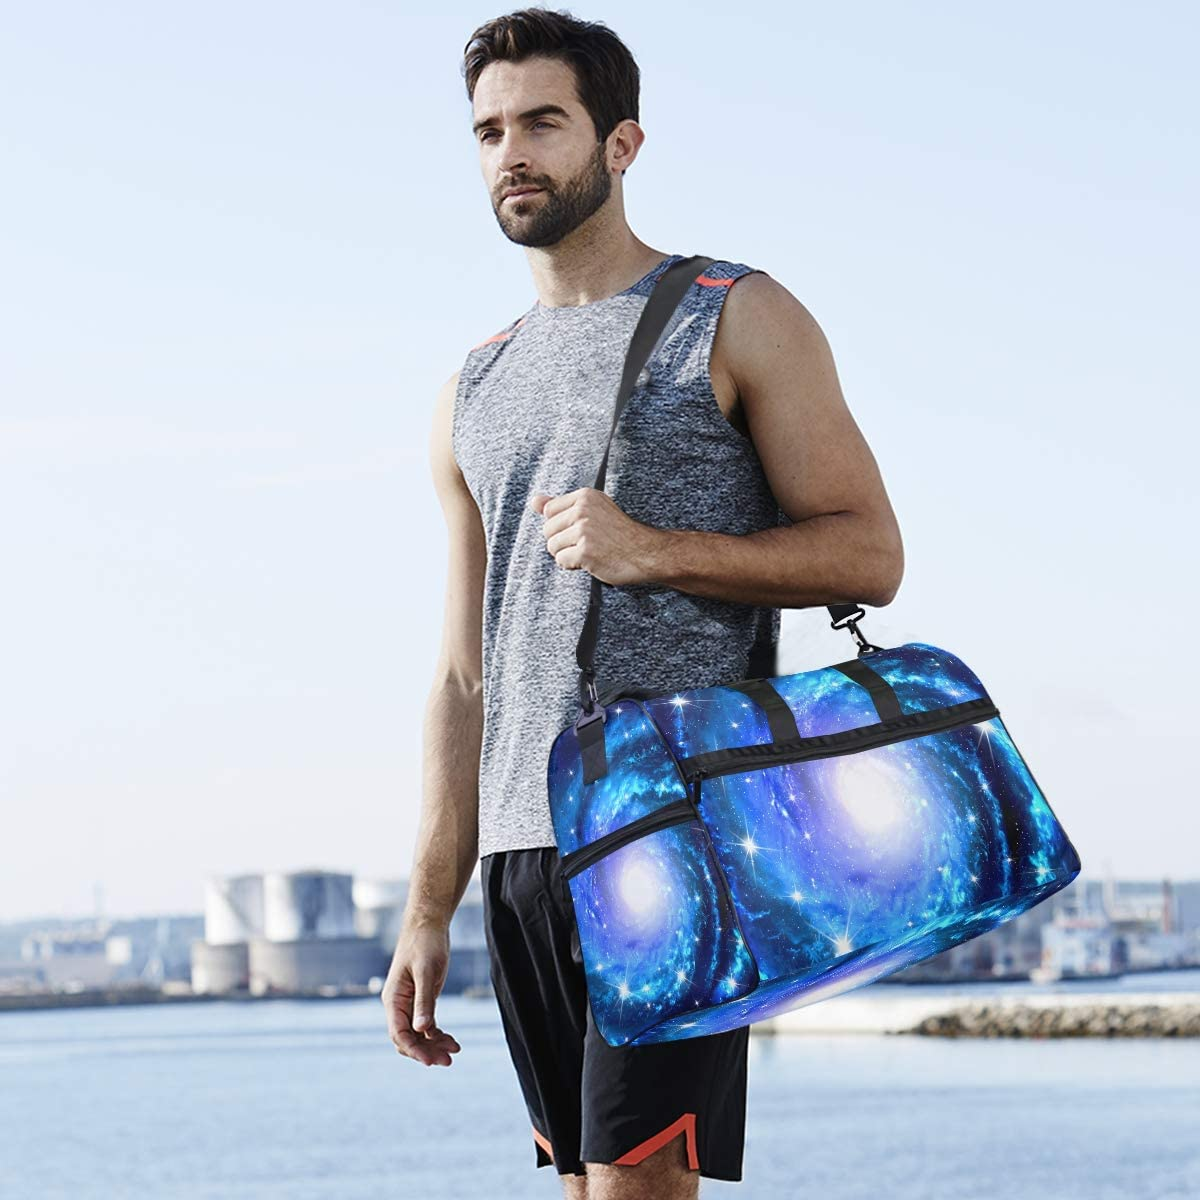 FANTAZIO Amazing Star River Sports Duffle Bag Gym Bag Travel Duffel with Adjustable Strap